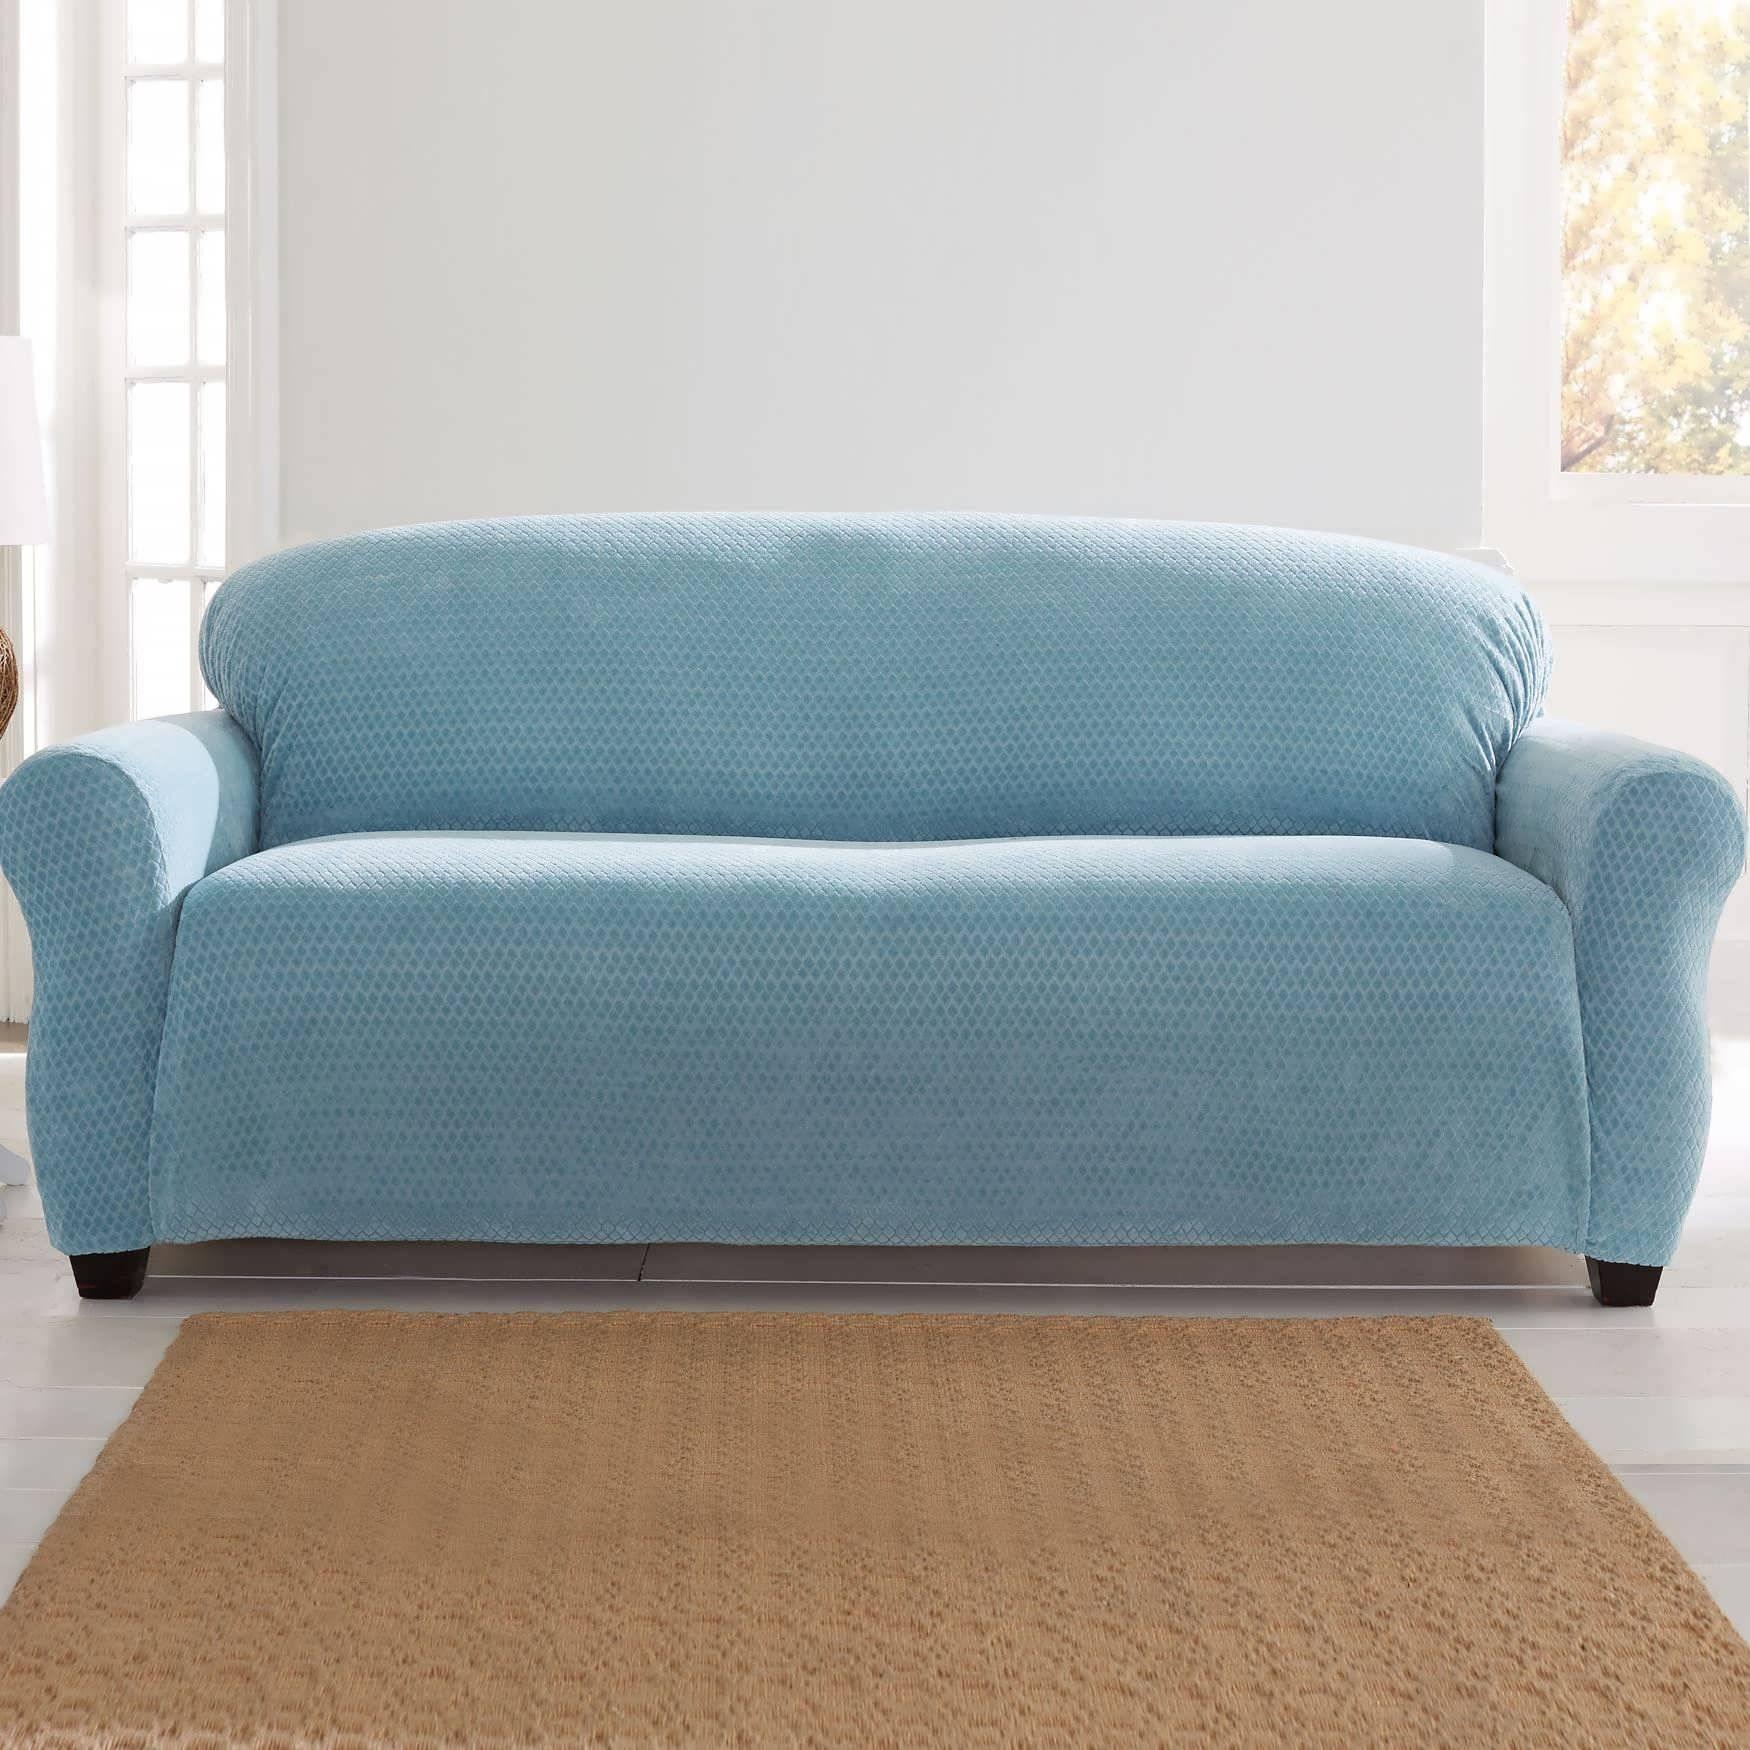 Sofa : Bob Furniture Sofa Shabby Chic Sofa Sofa Beds Sofa With Regard To Shabby Chic Sofa Slipcovers (View 12 of 15)